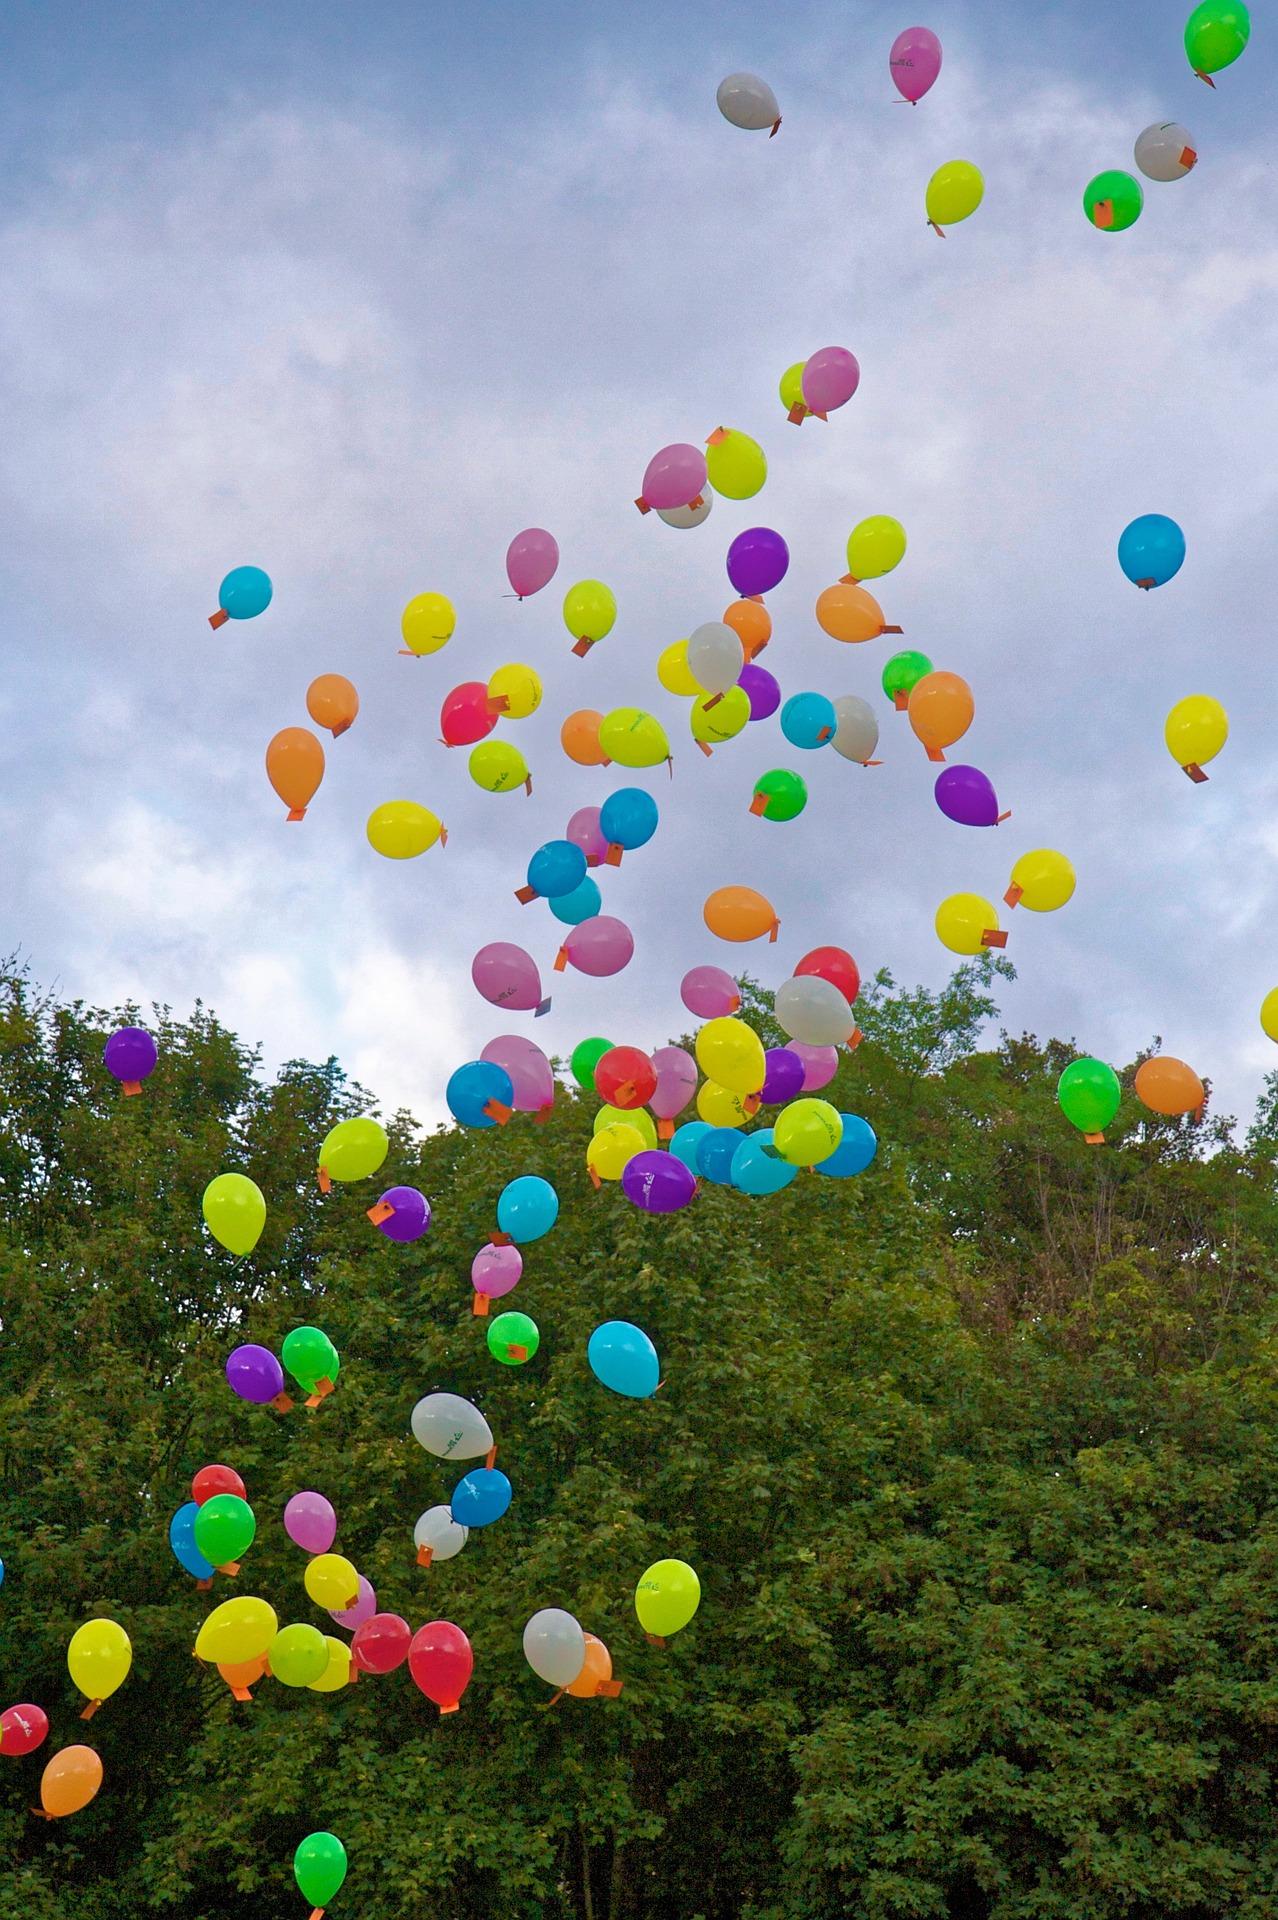 balloons-1191912_1920-1464337165.jpg